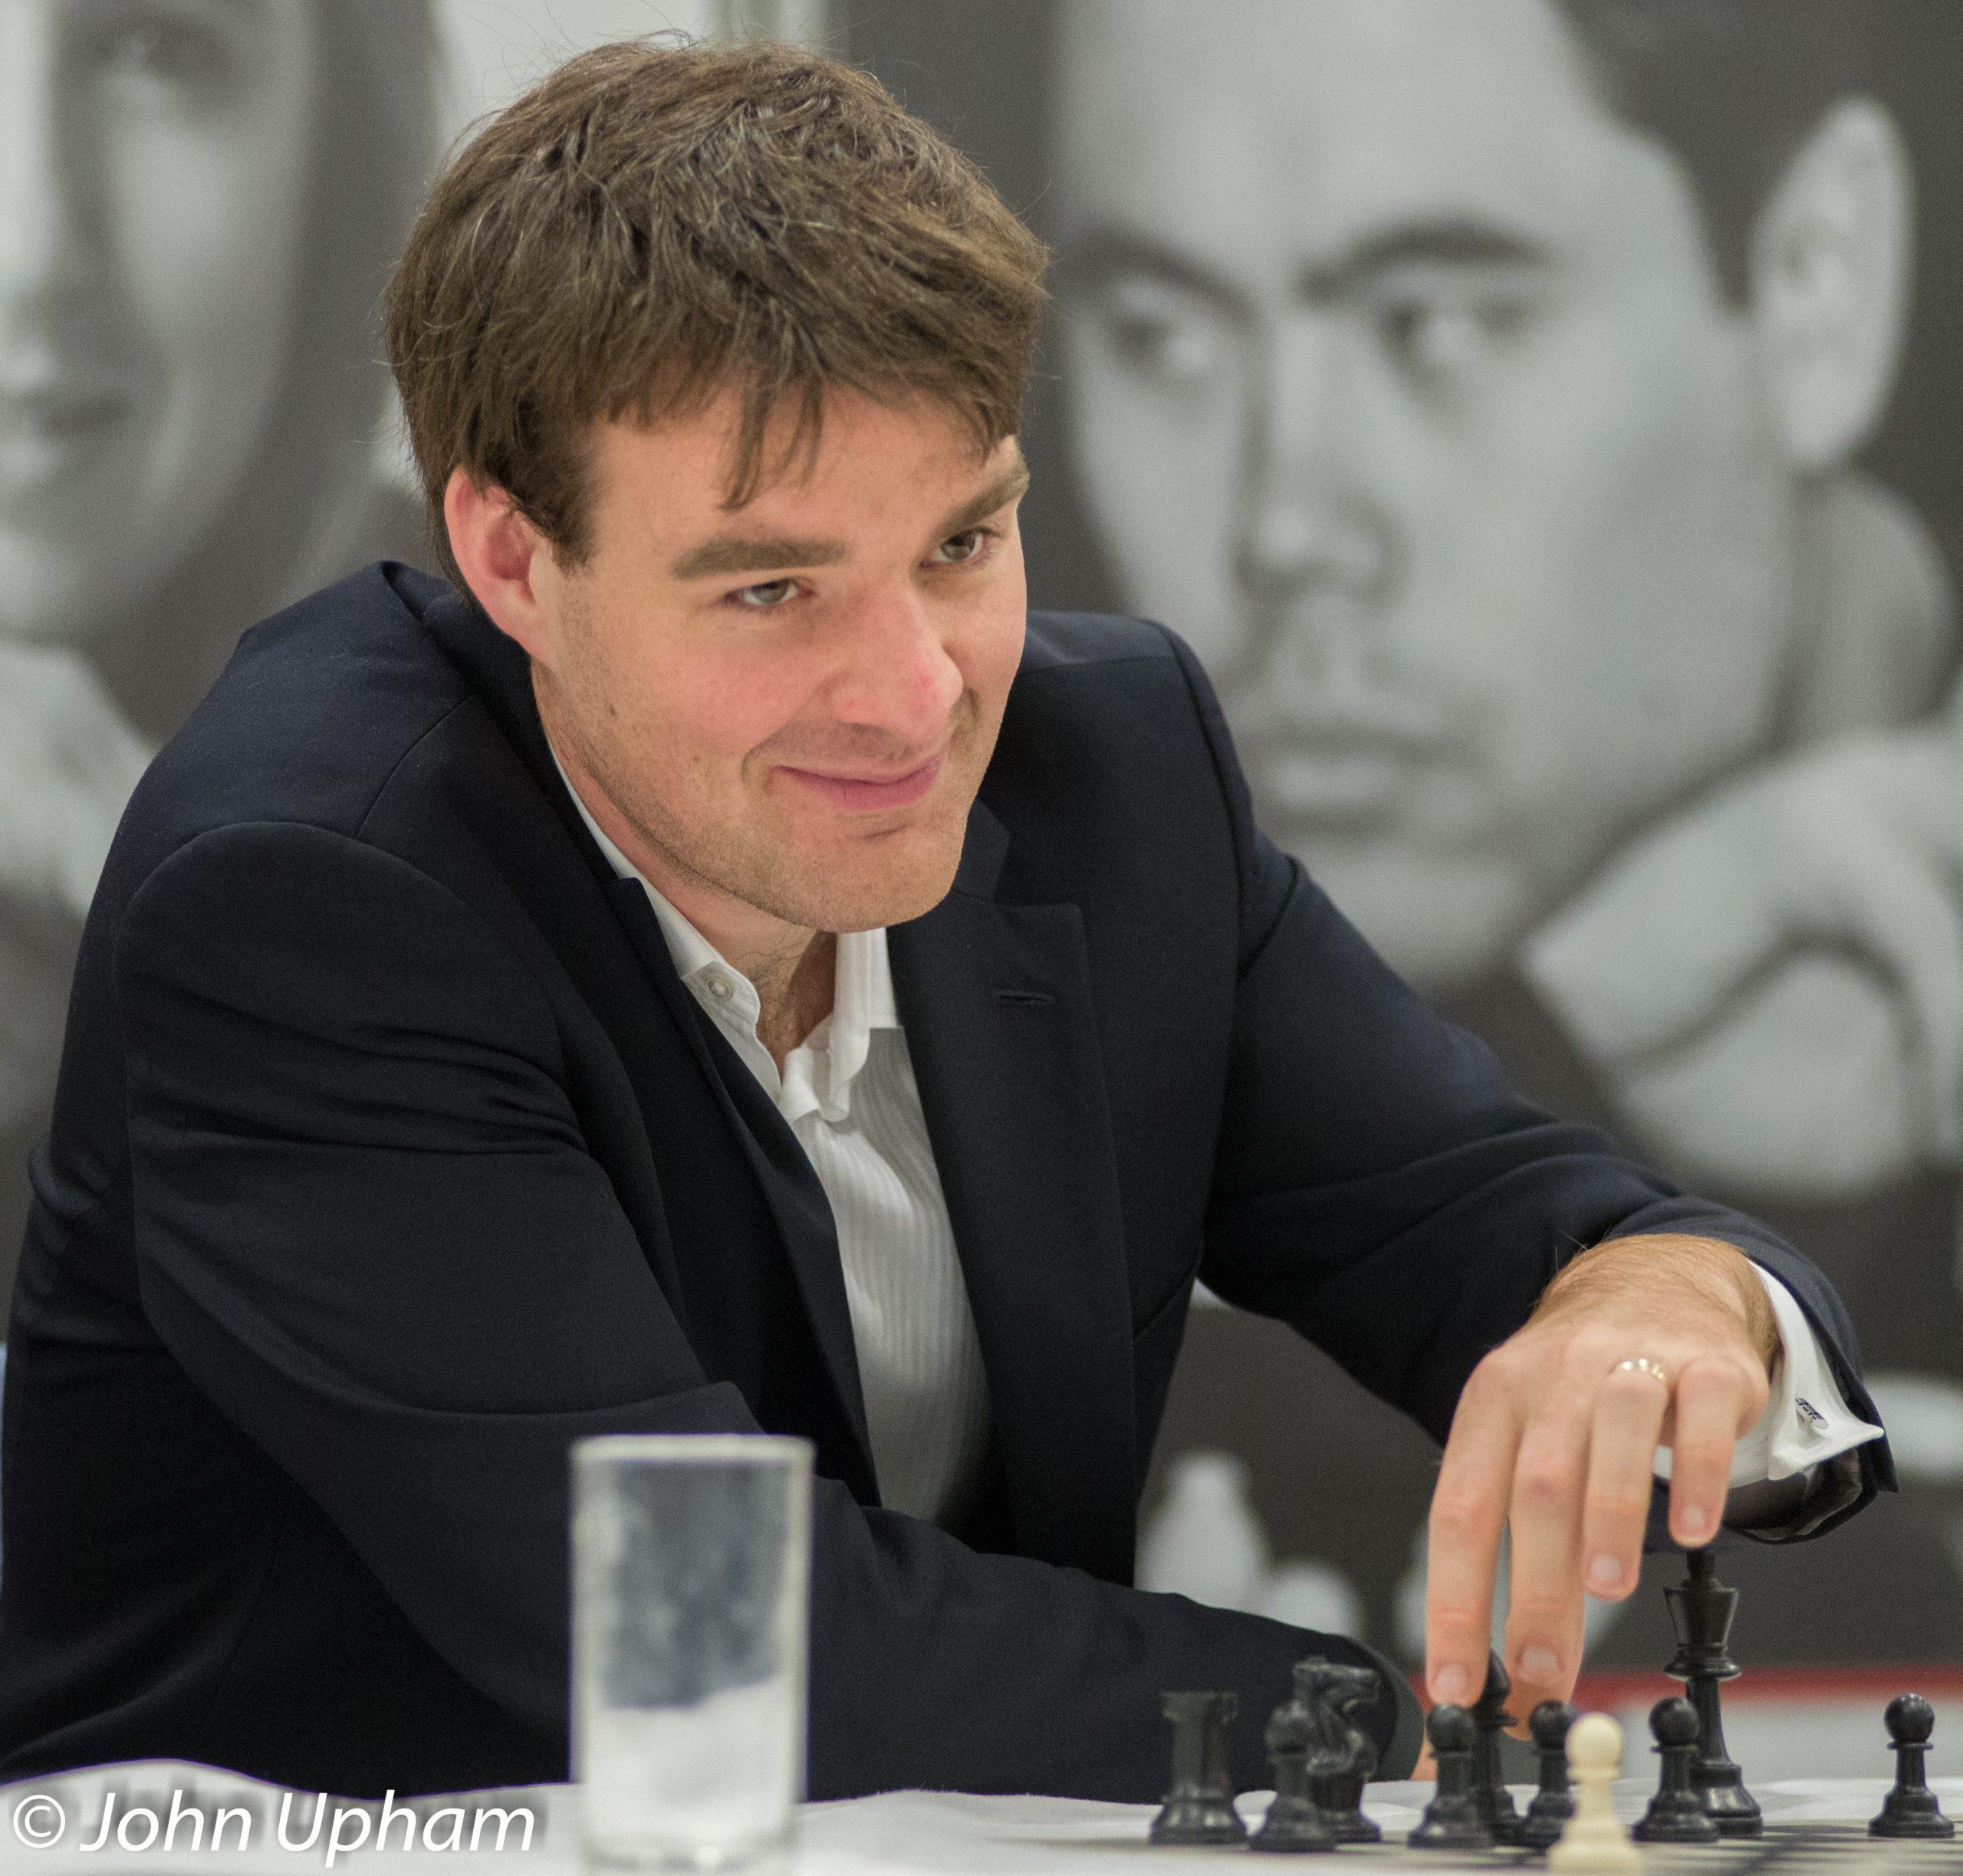 GM Gawain Jones at the 2013 London Chess Classic courtesy of John Upham Photography